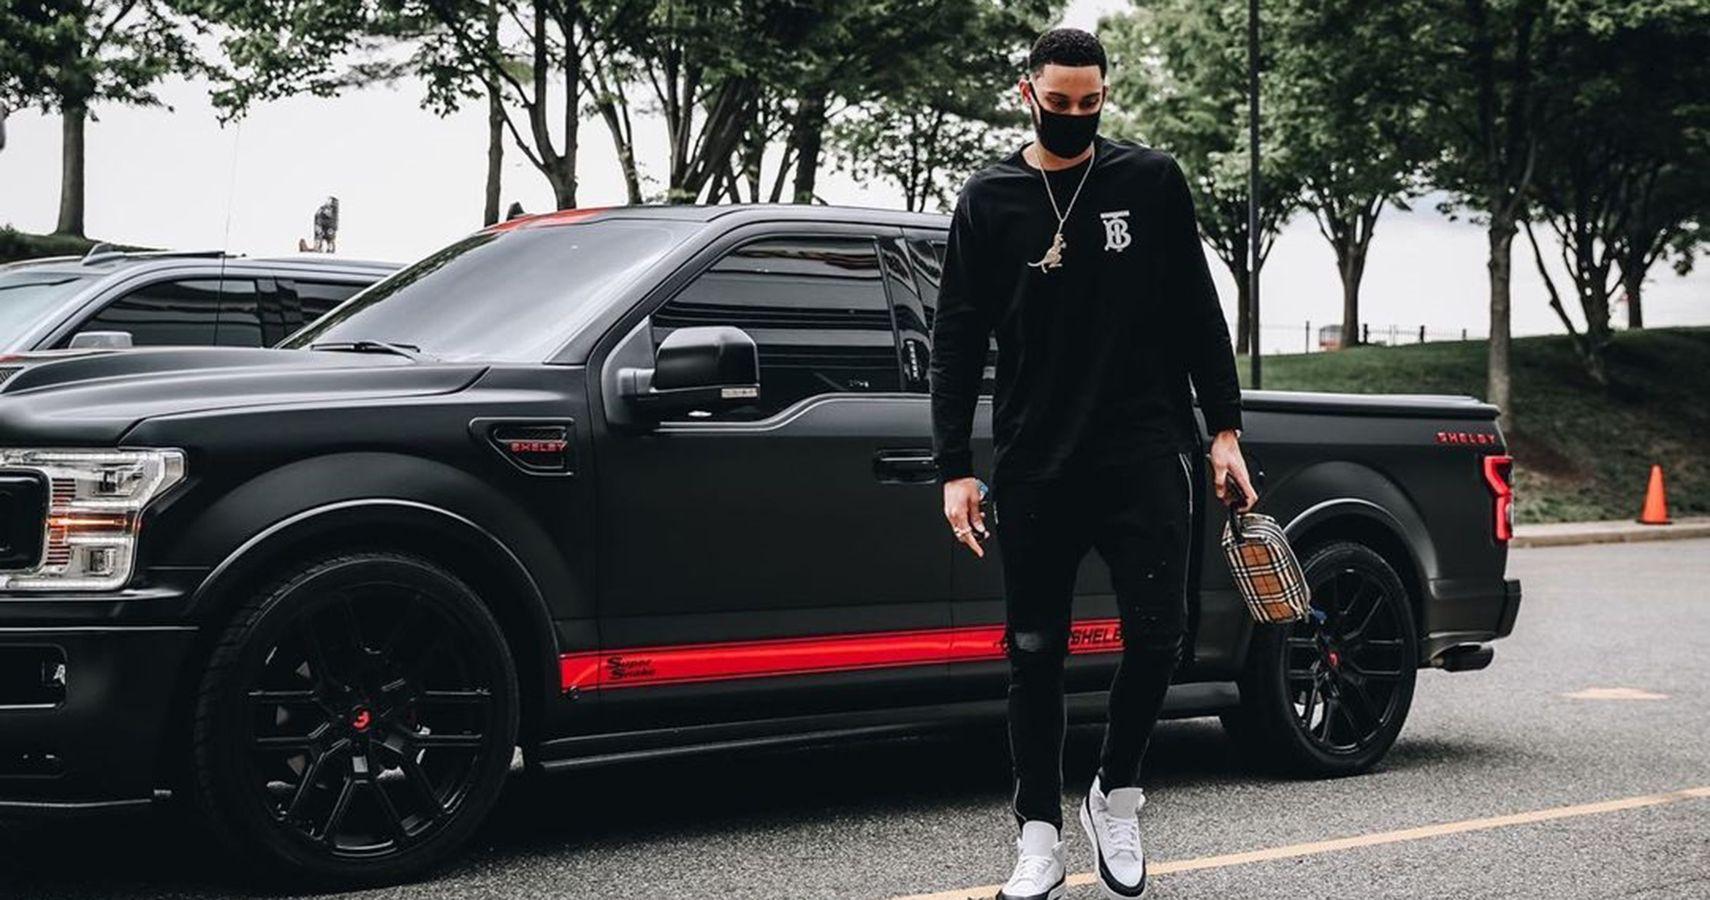 NBA Star Ben Simmons Flaunts A Stunning Black Shelby F-150 Super Snake